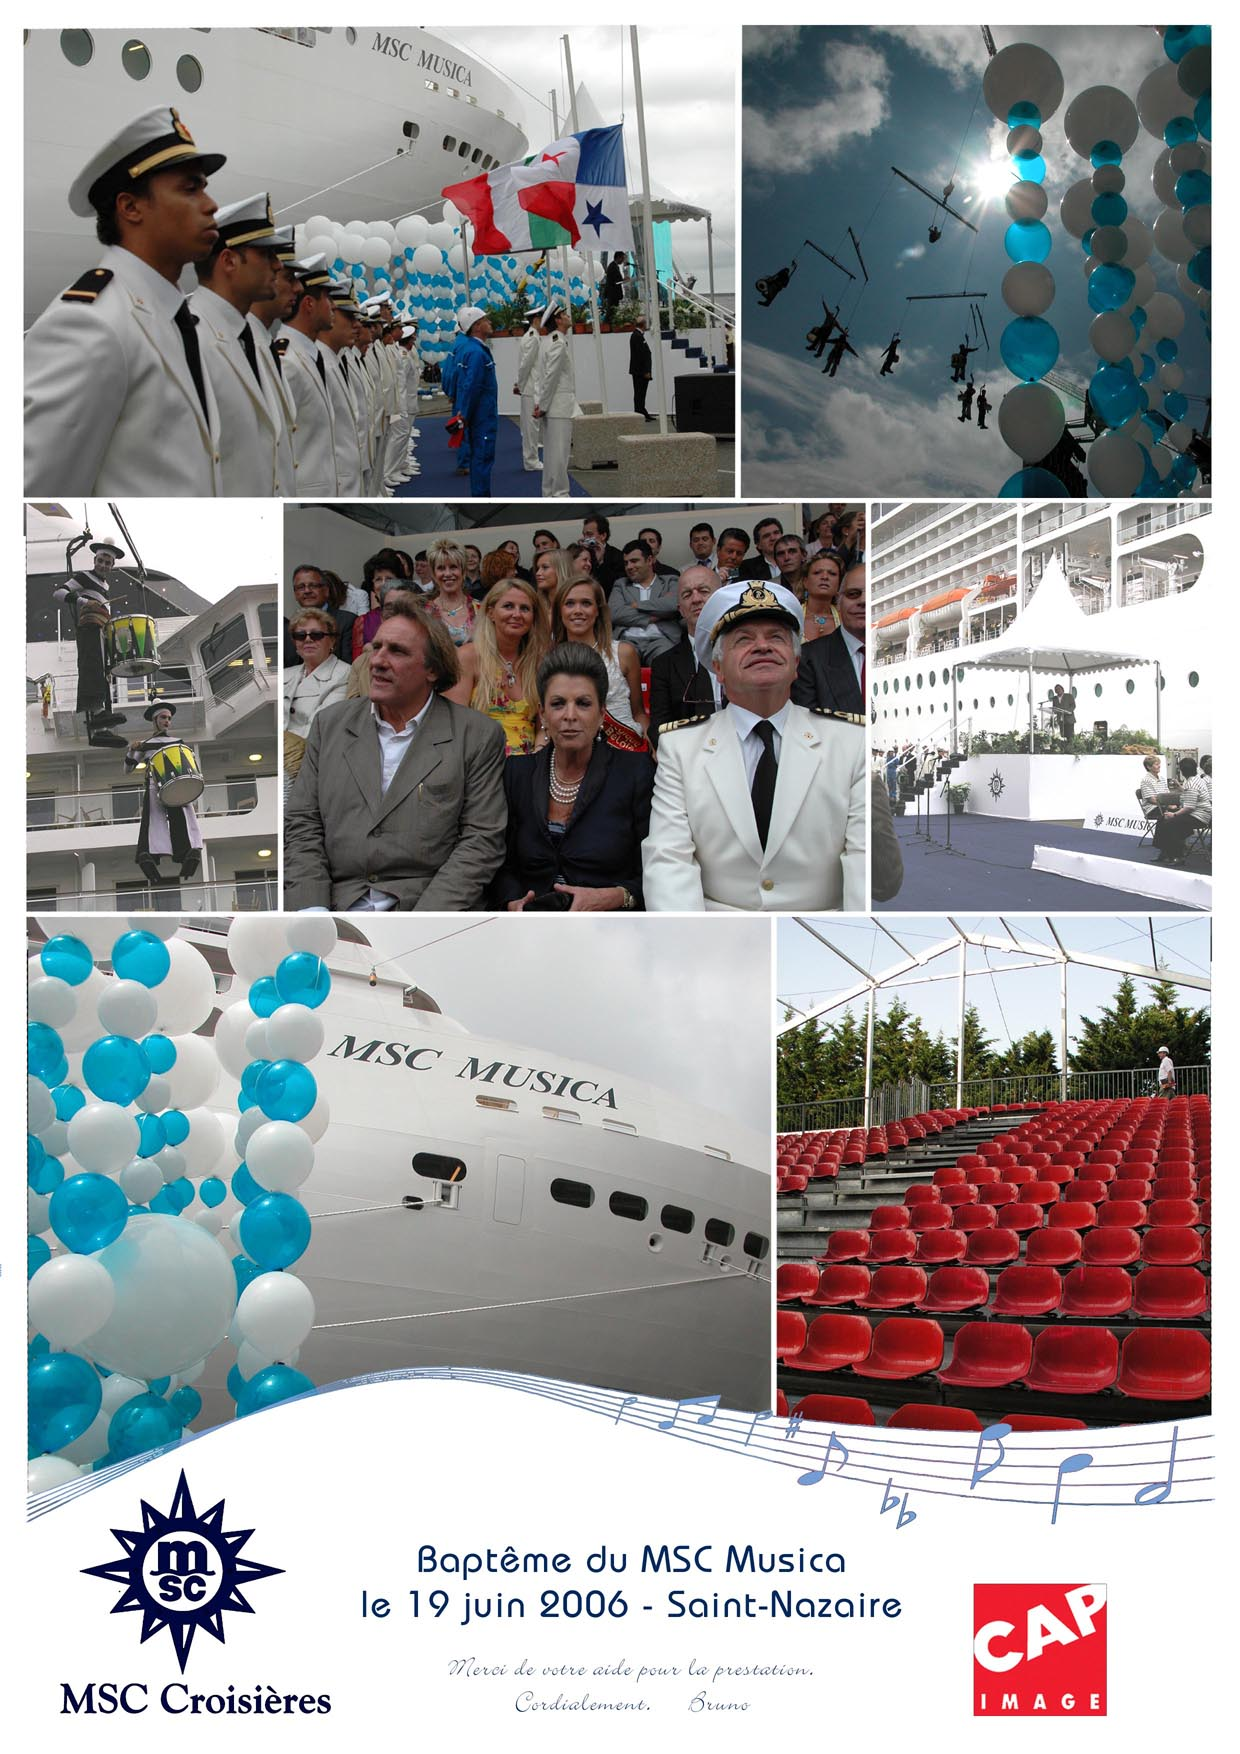 inauguration du paquebot MSC Musica